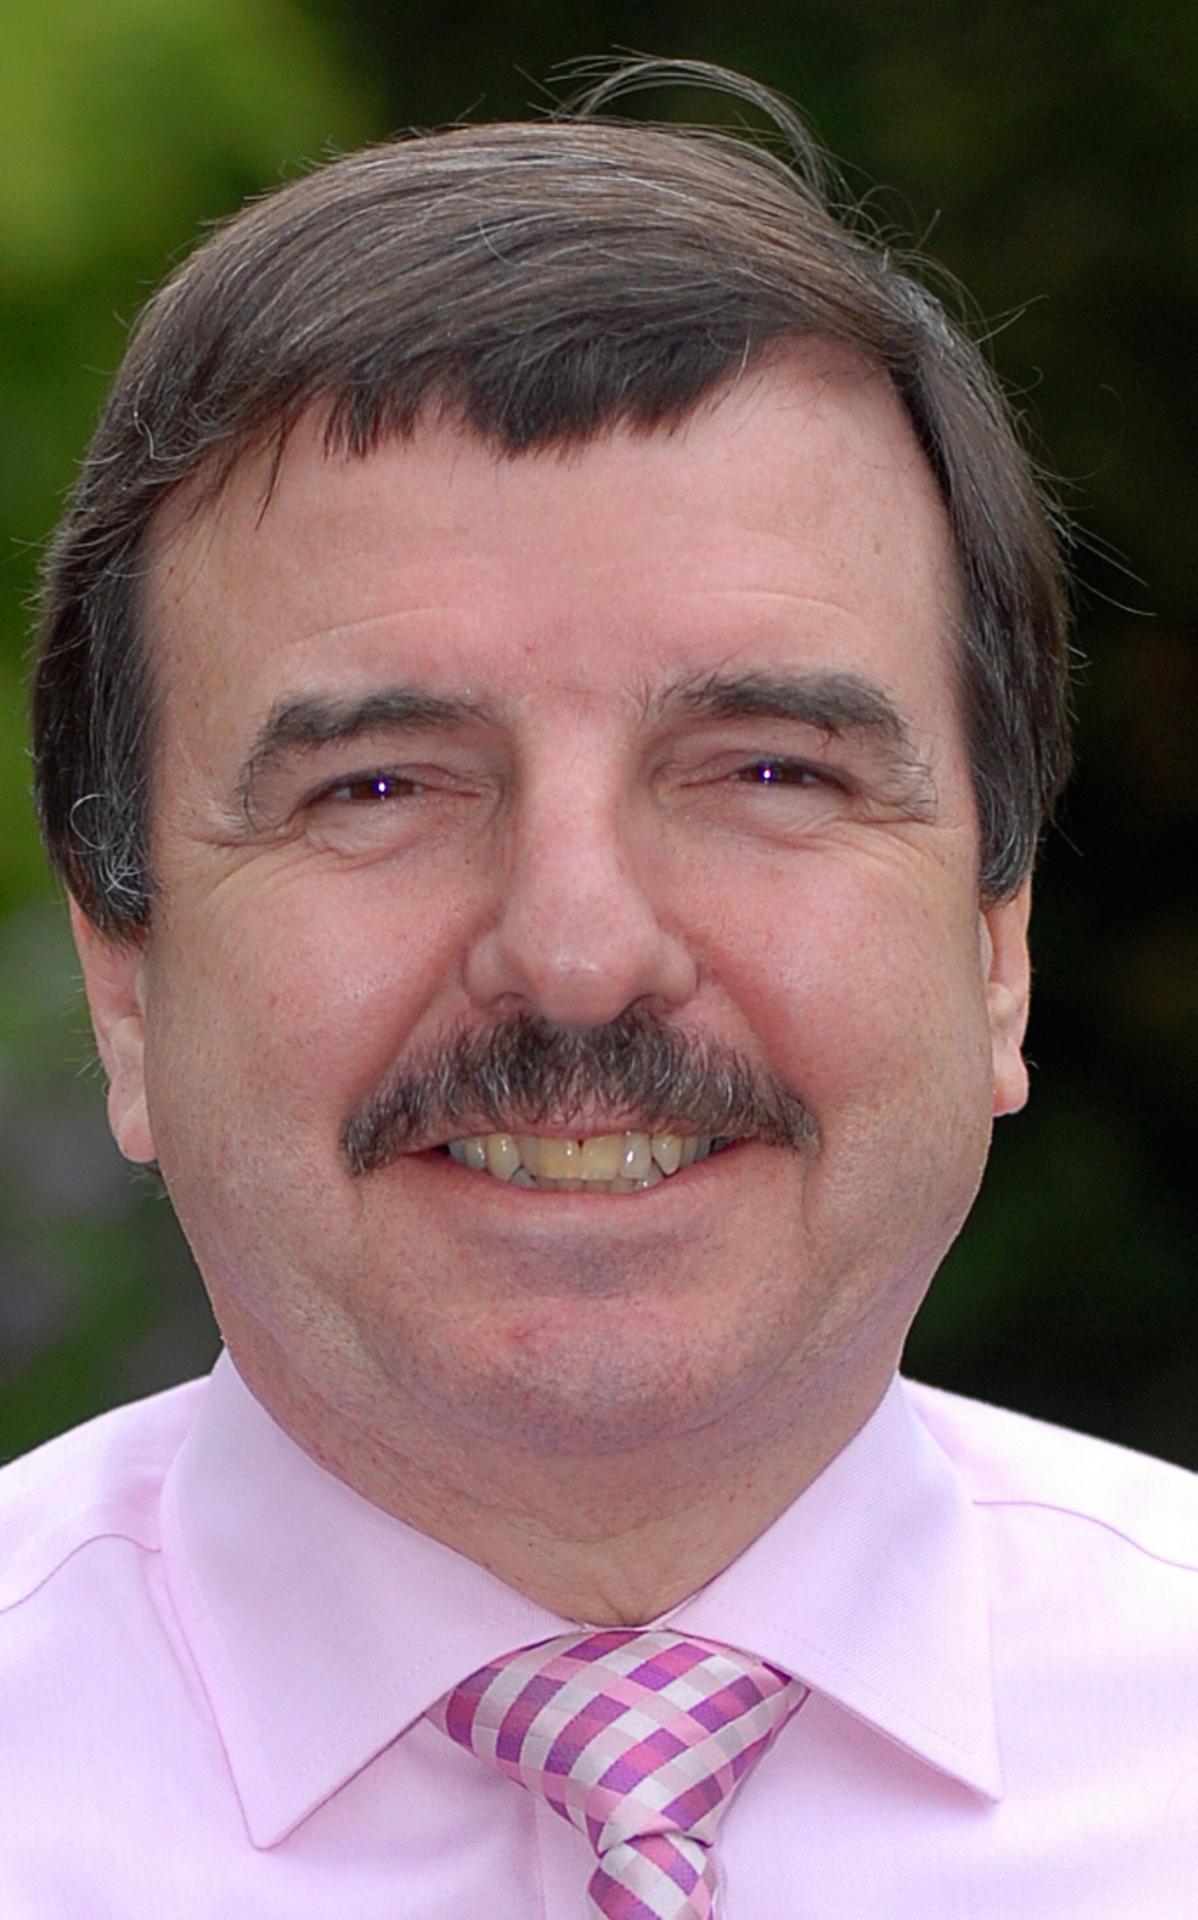 Chris Woodward